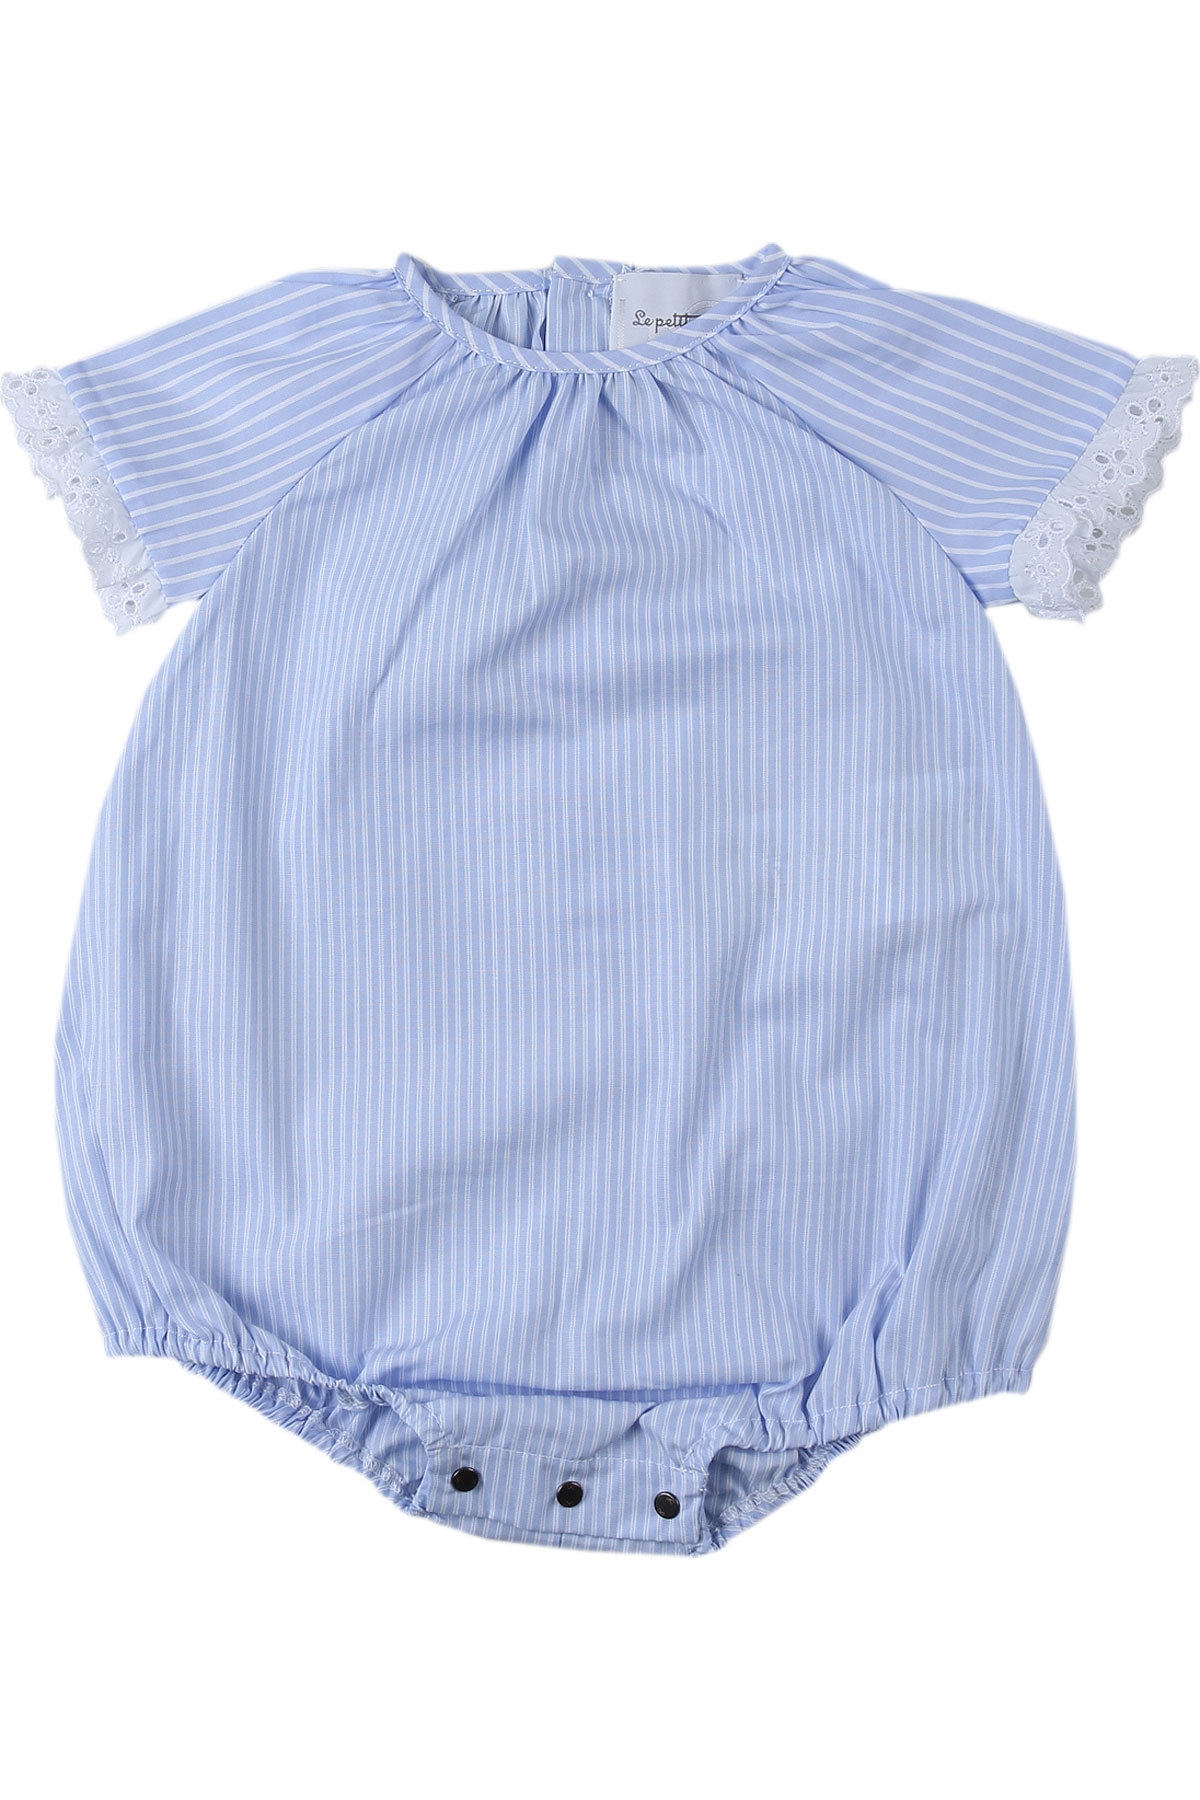 Le Petit Coco Baby Bodysuits & Onesies for Girls On Sale, Blue, Cotton, 2019, 3M 6M 9M